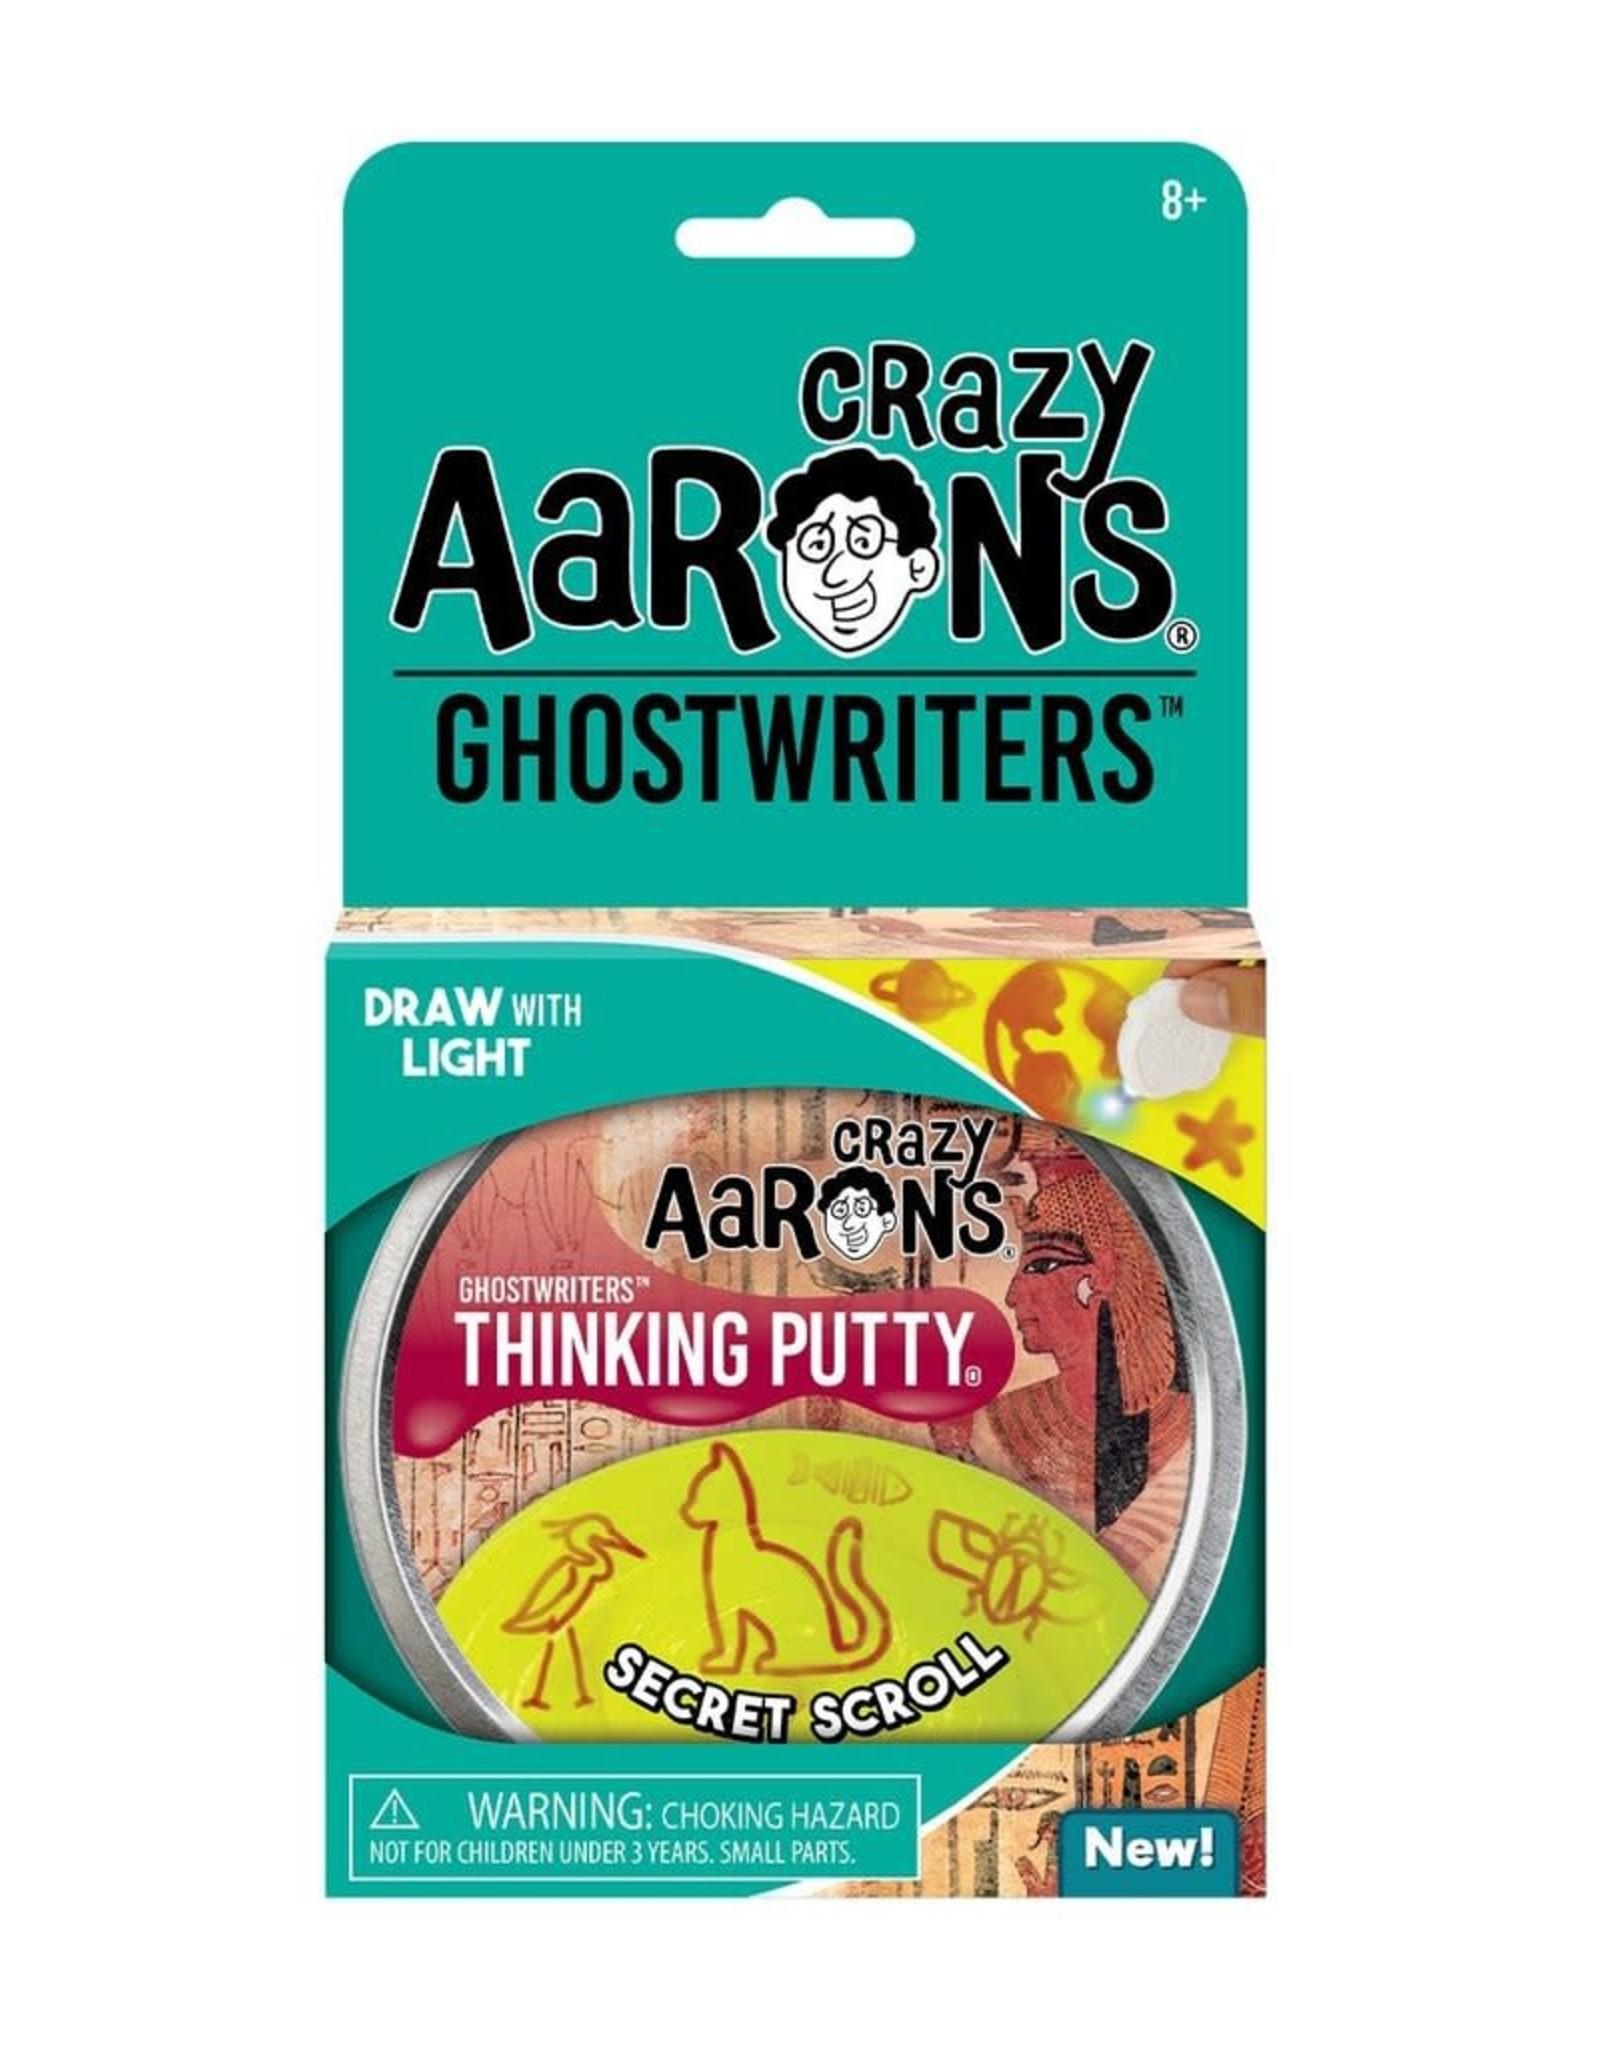 Crazy Aarons Putty Secret Scroll